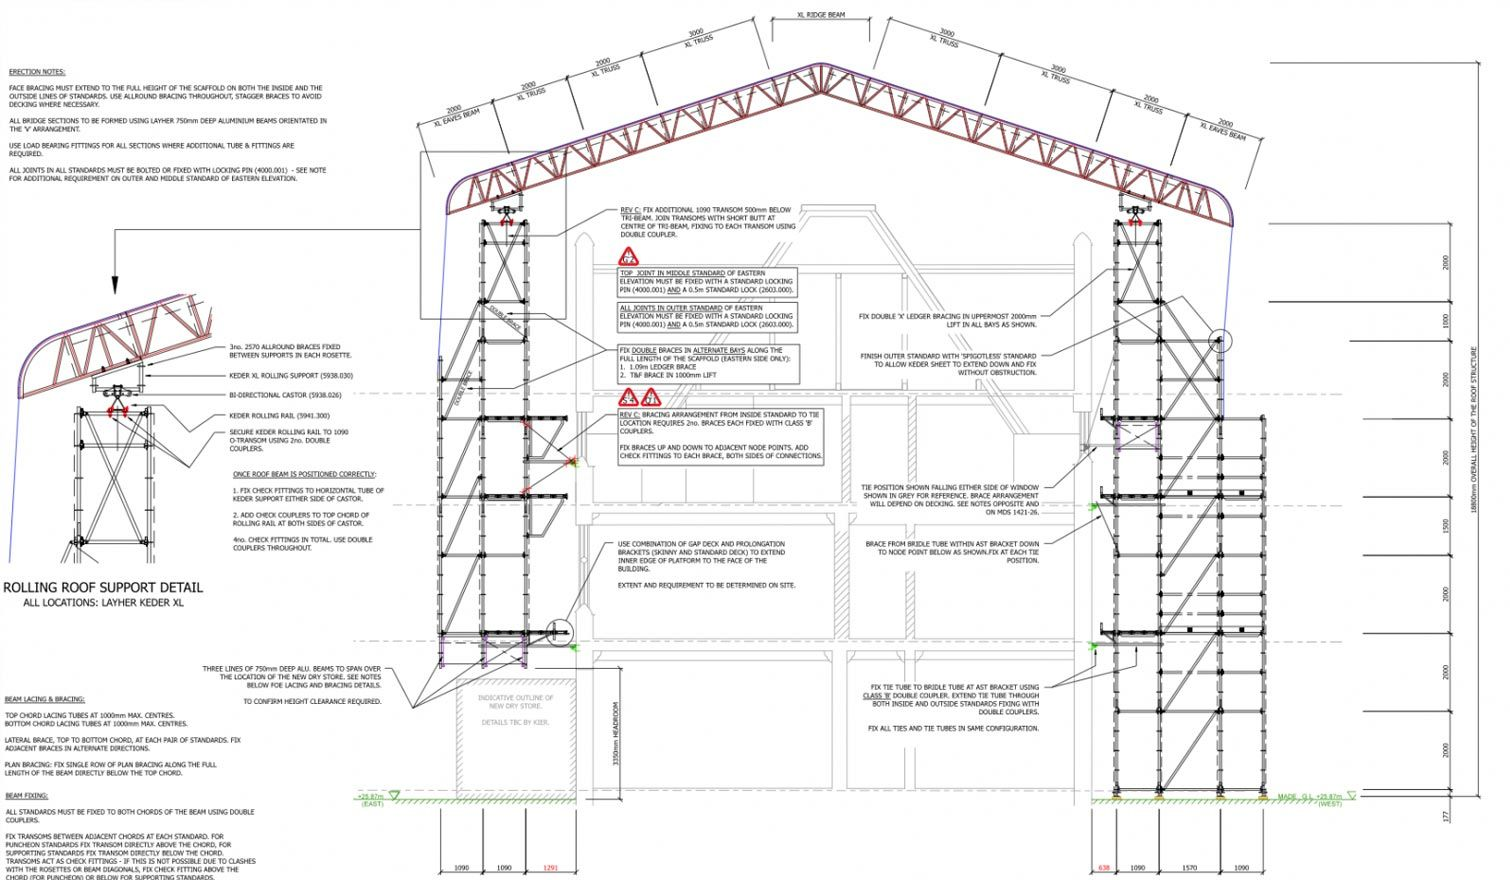 Design Calculations - 48 3 Scaffold Design | 48 3 Scaffold Design